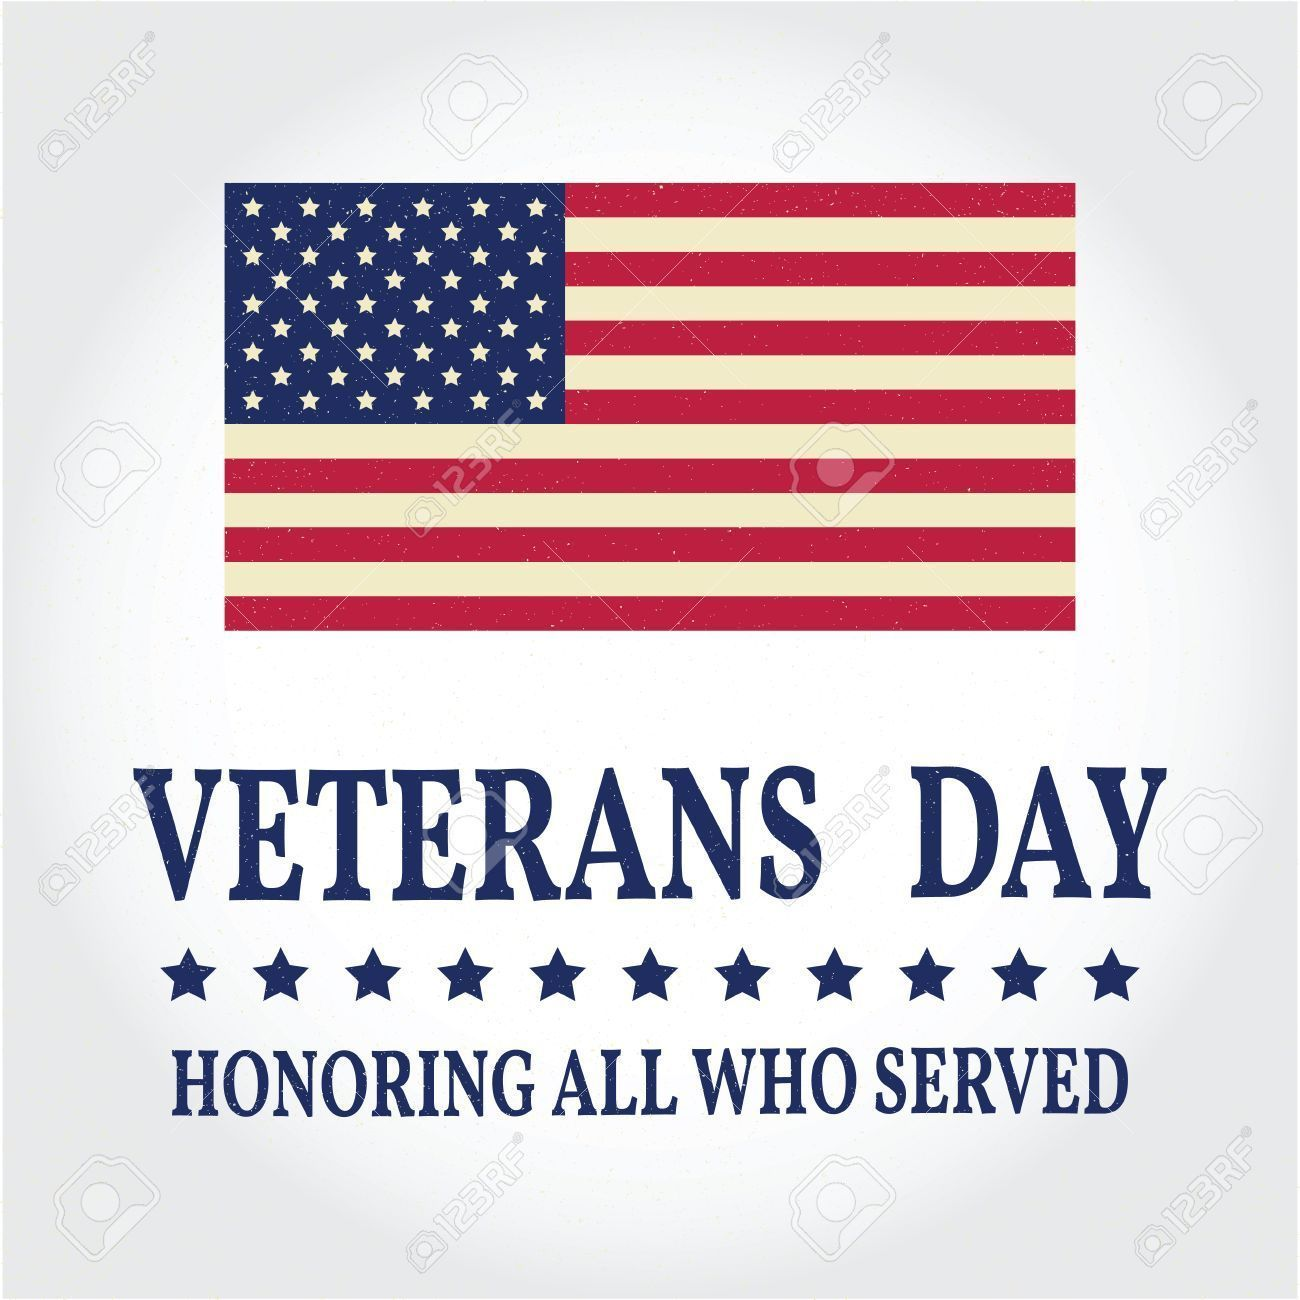 Veterans Day Veterans Day Vector Veterans Day Drawing